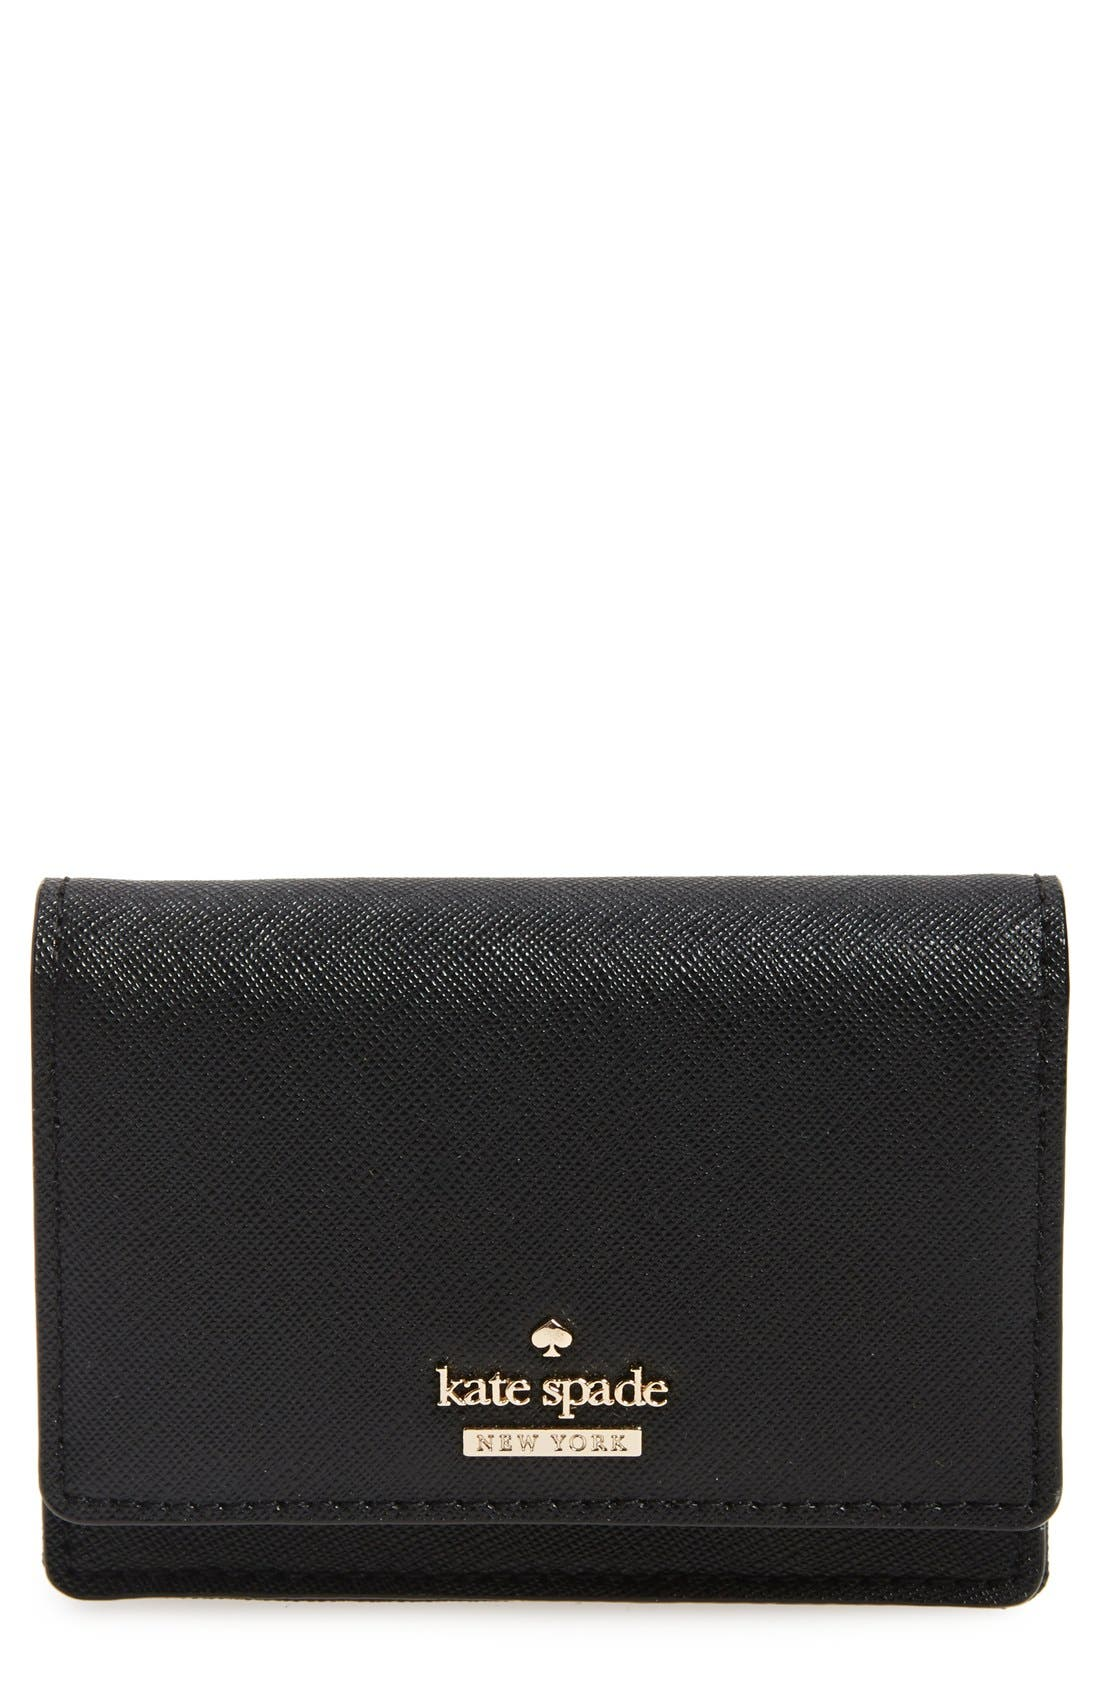 Main Image - kate spade new york 'cameron street - beca' textured leather wallet